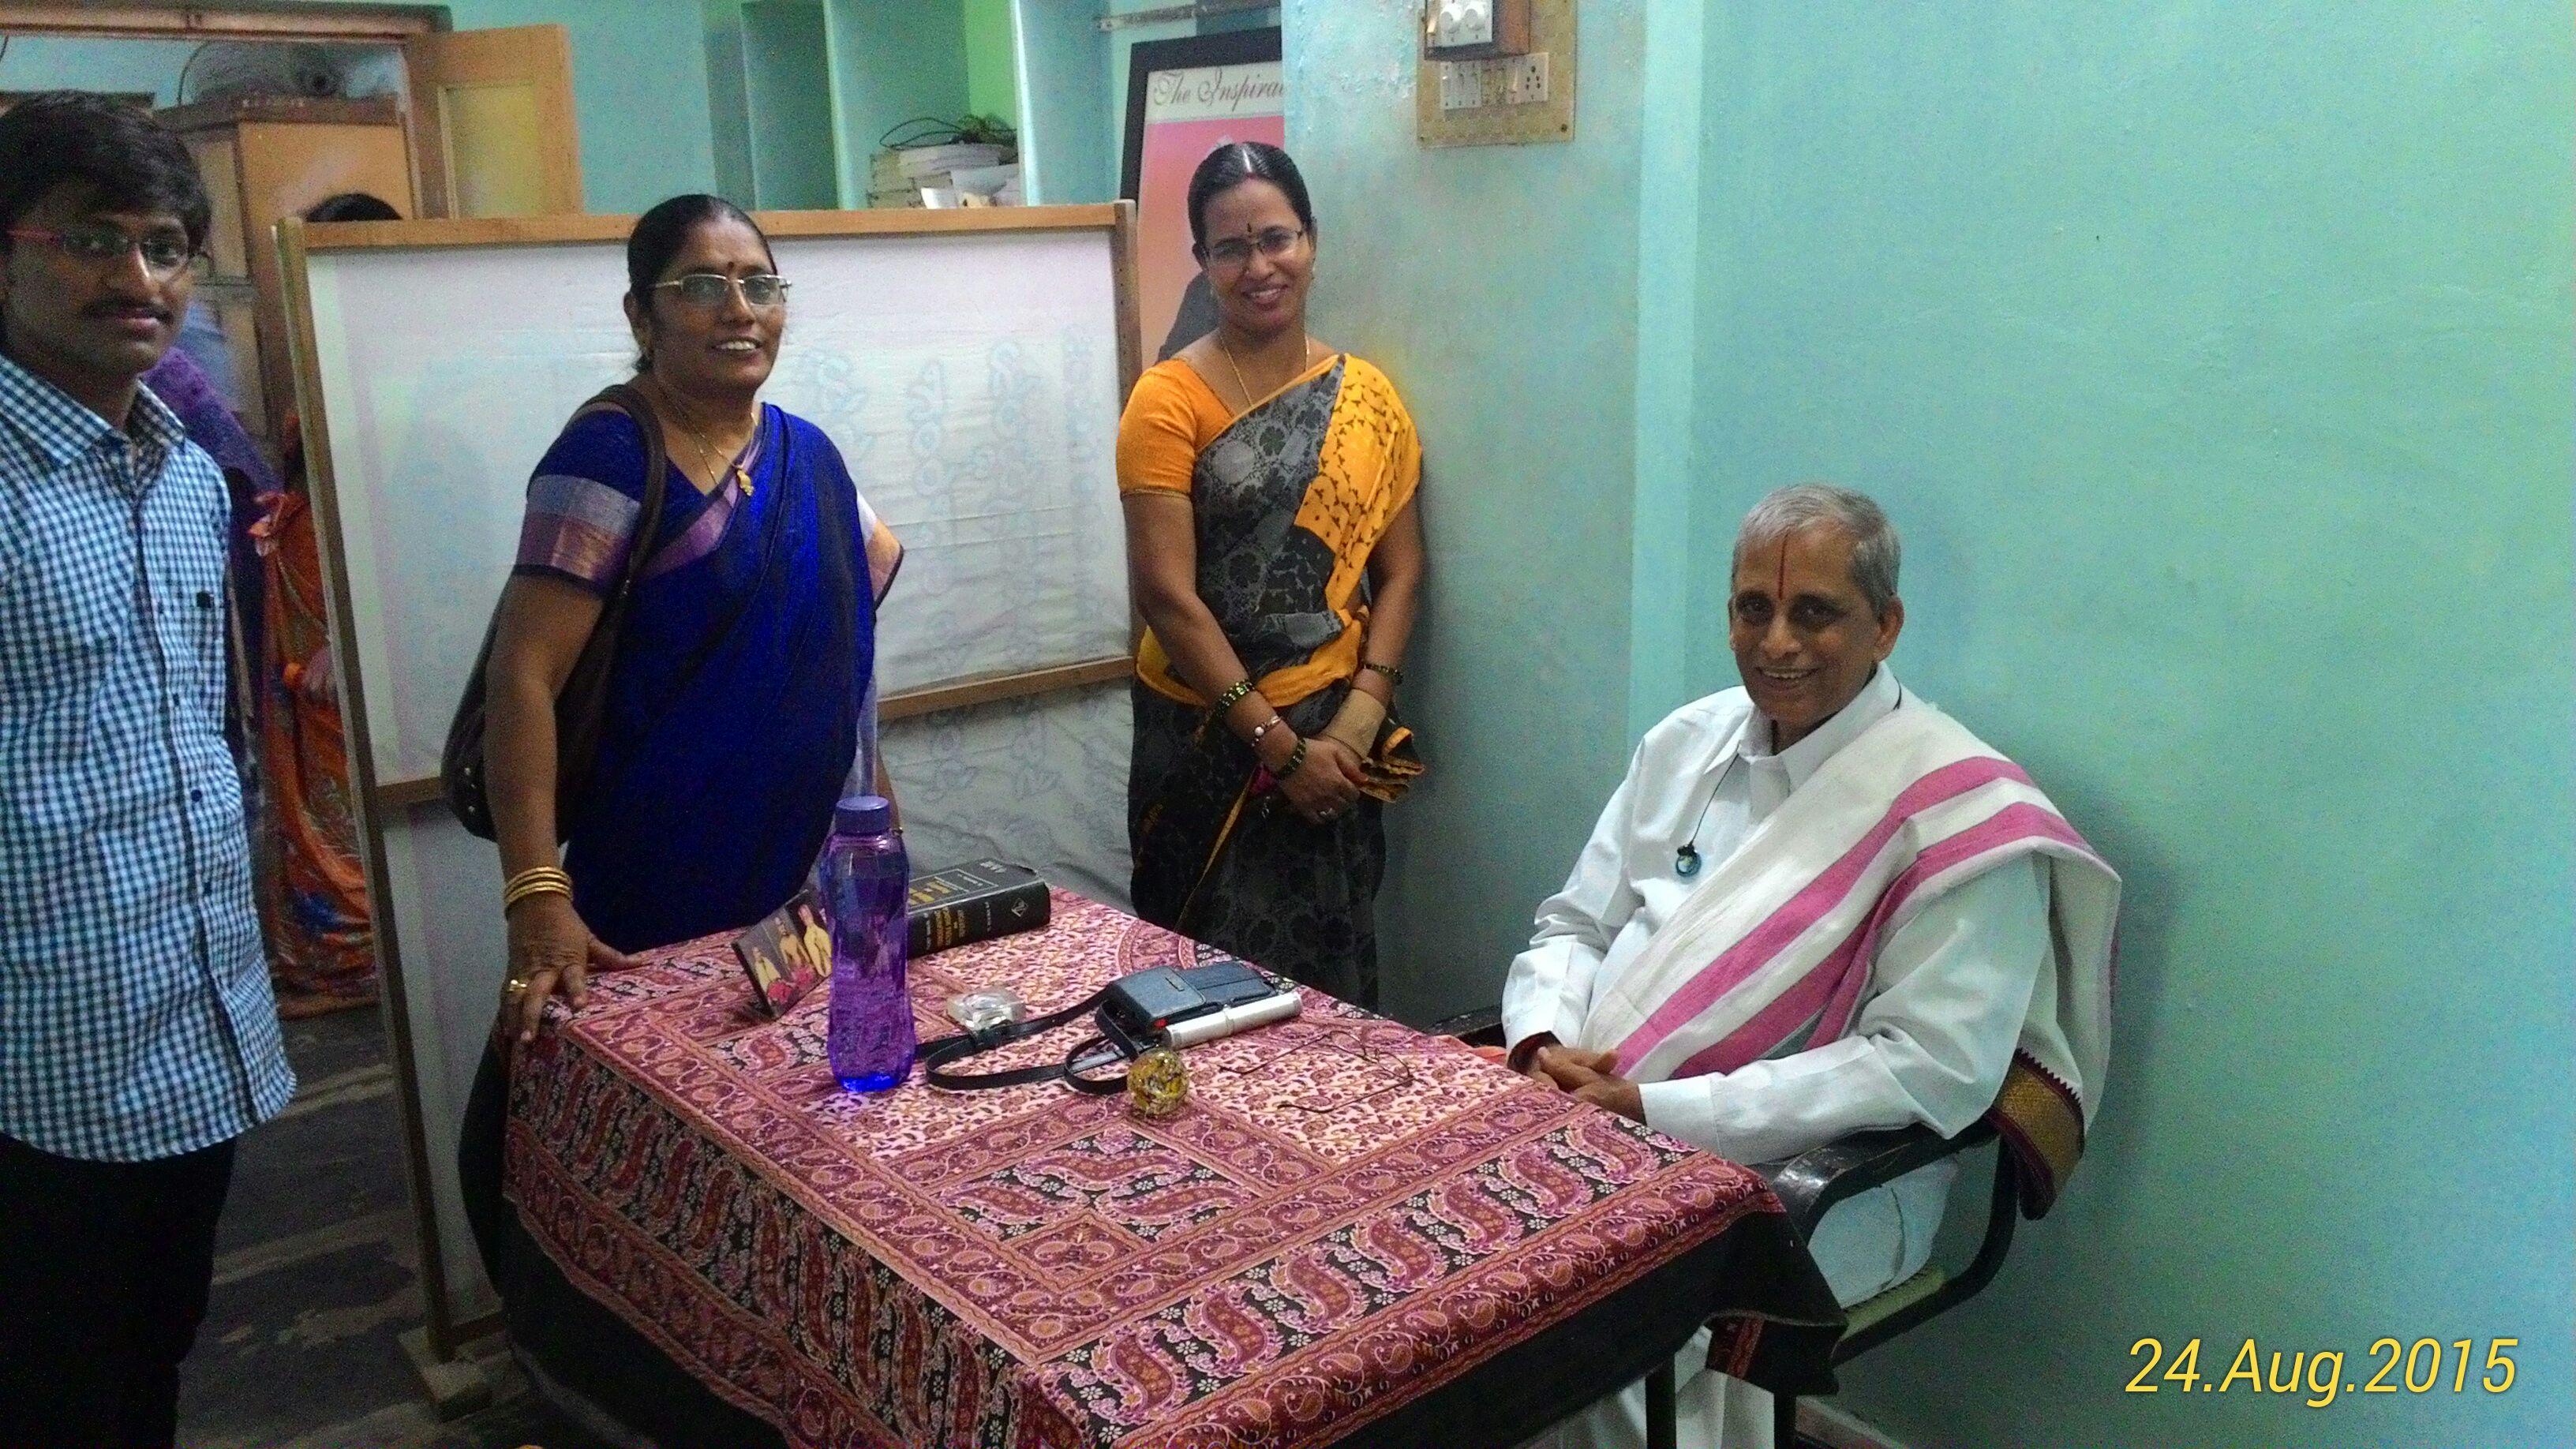 Dr Ekkirala Ananthakrishna garu with our doctor Dr N Aruna Kumari garu